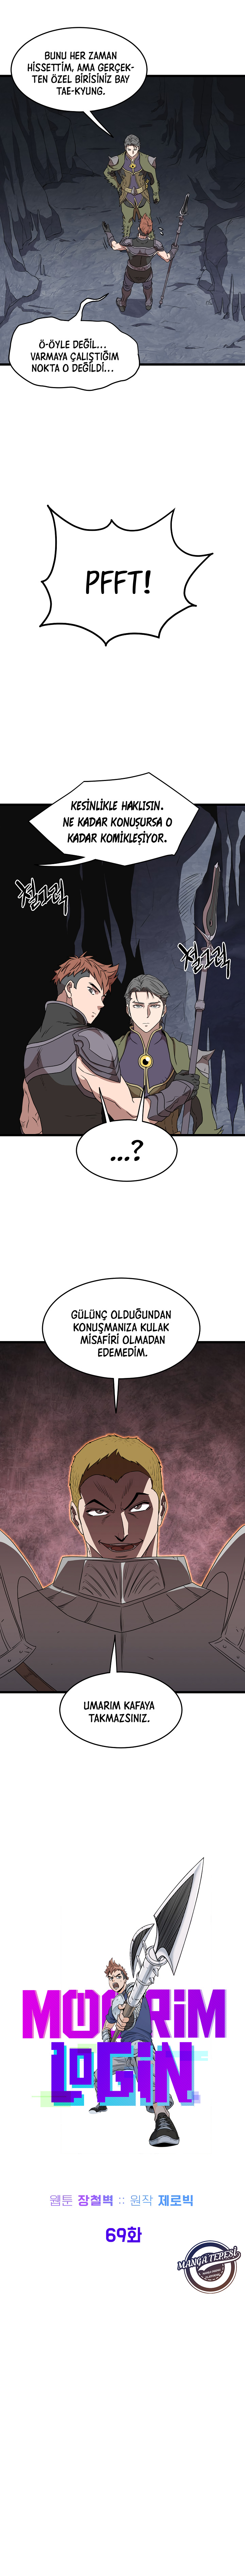 murim-login69-bolum